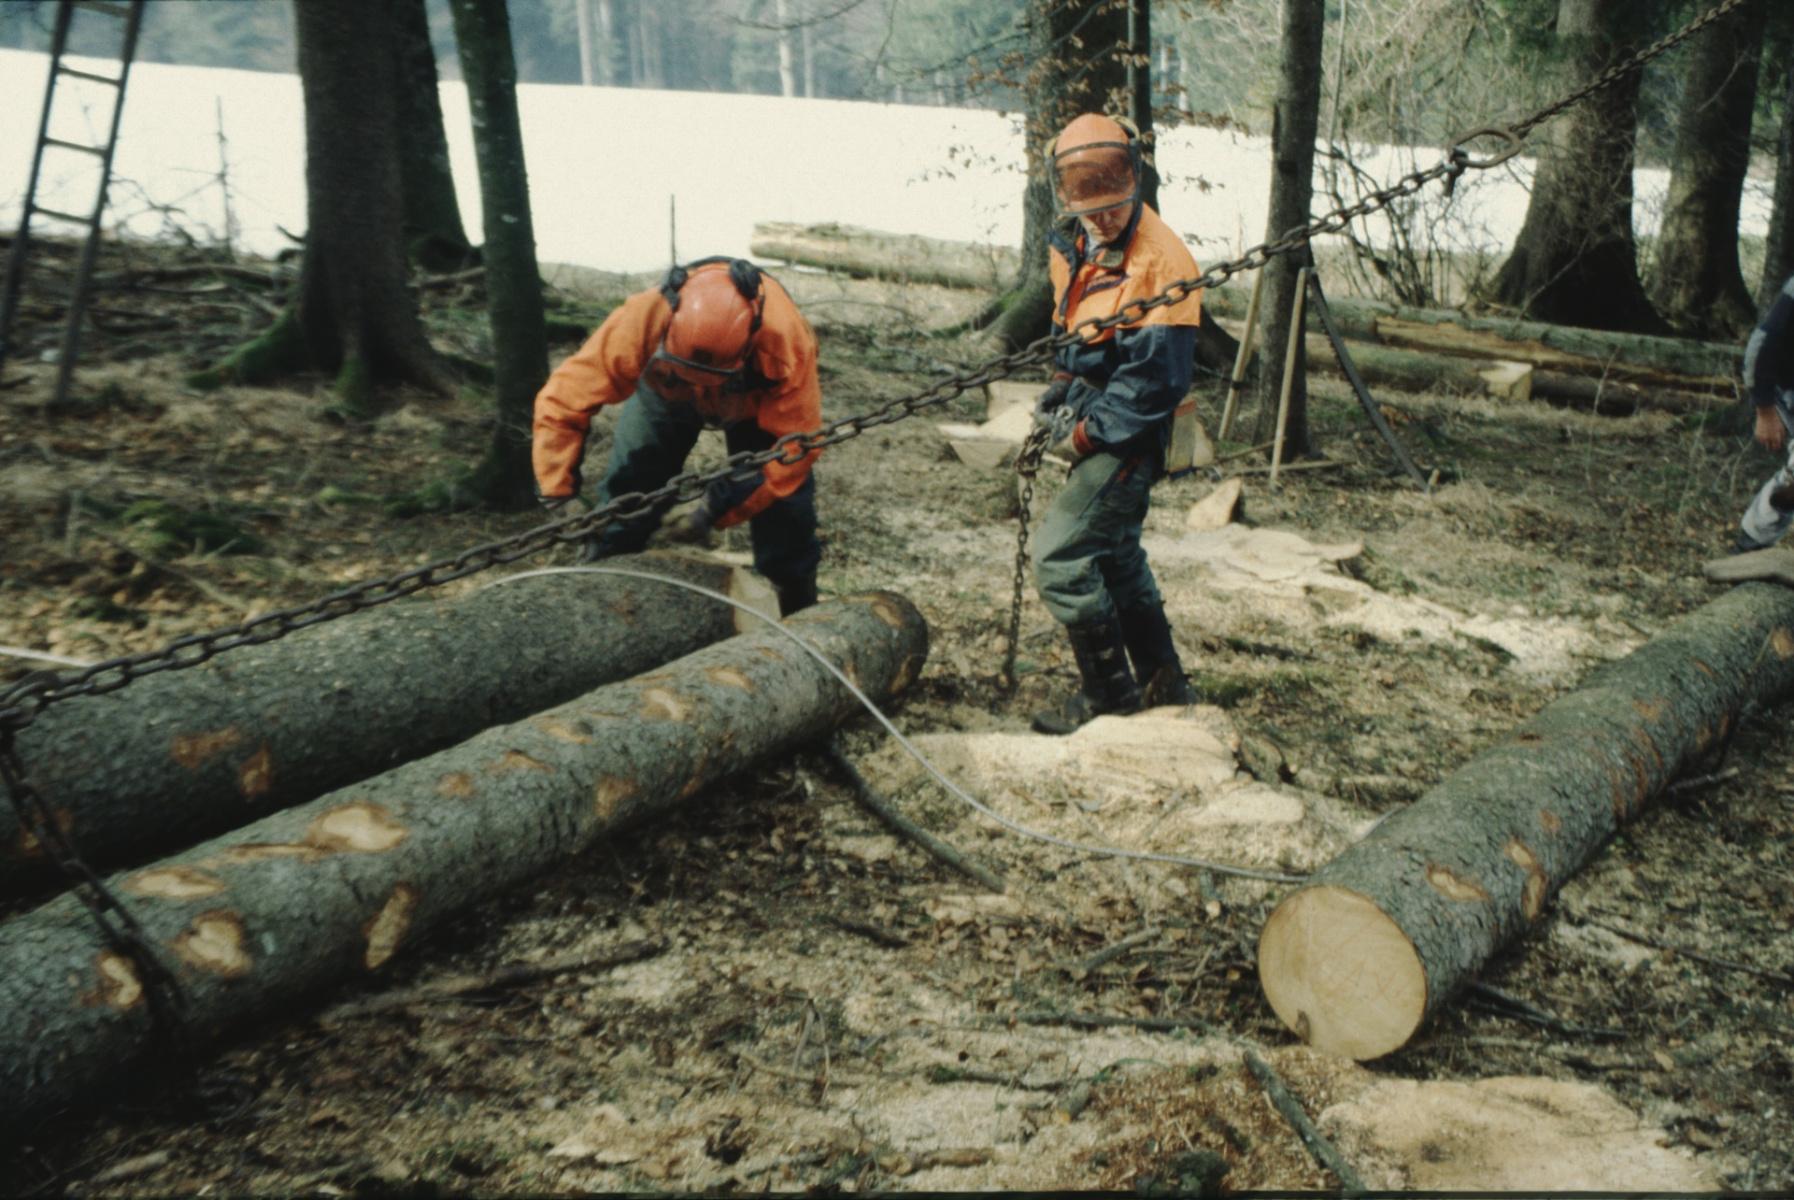 Bäume fällen, Bereitmachen zum Abtransport